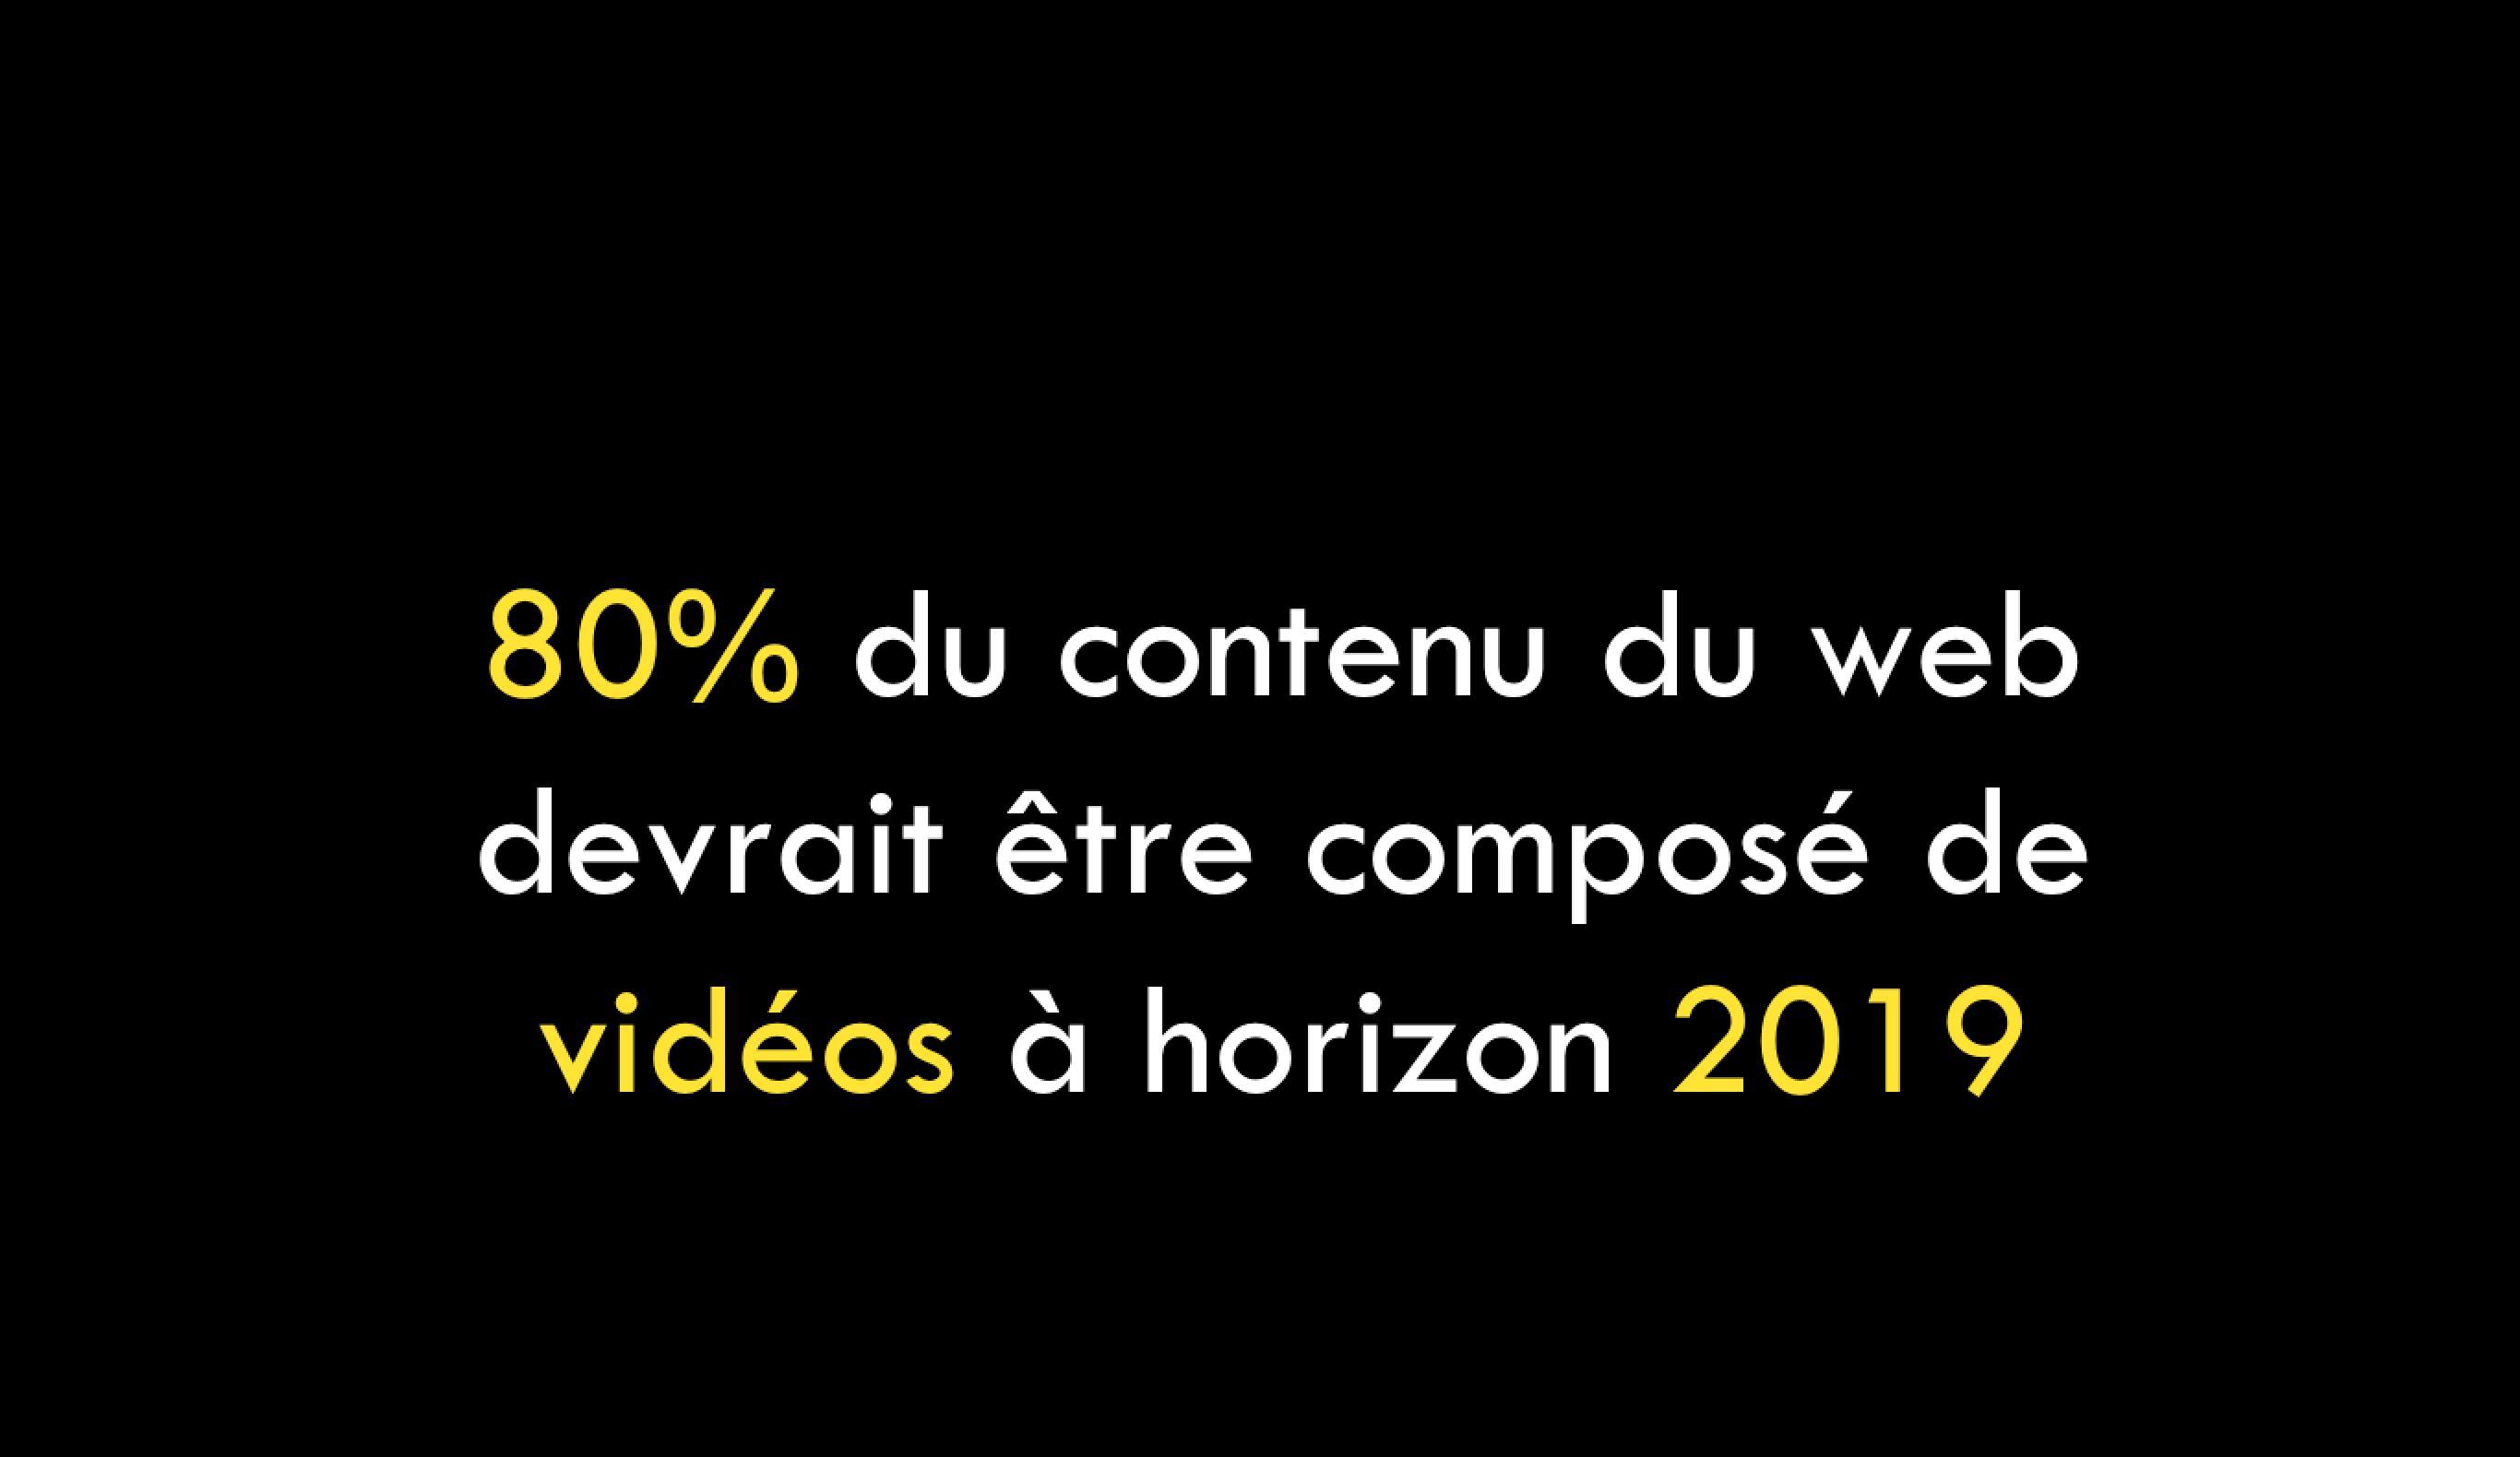 video live tendance digitale